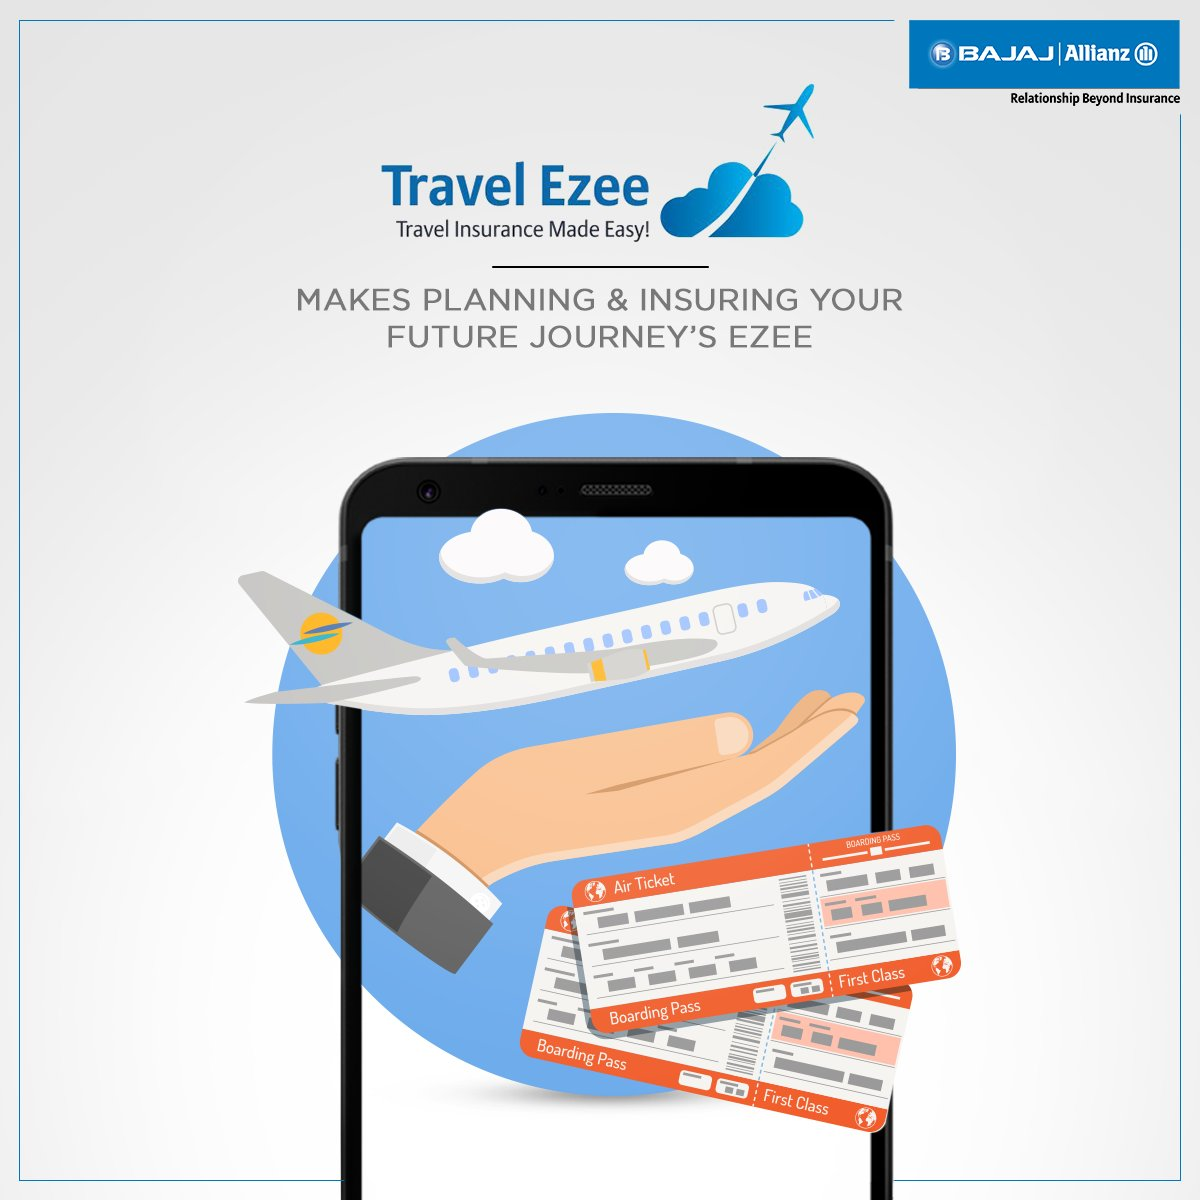 bajaj allianz travel insurance review